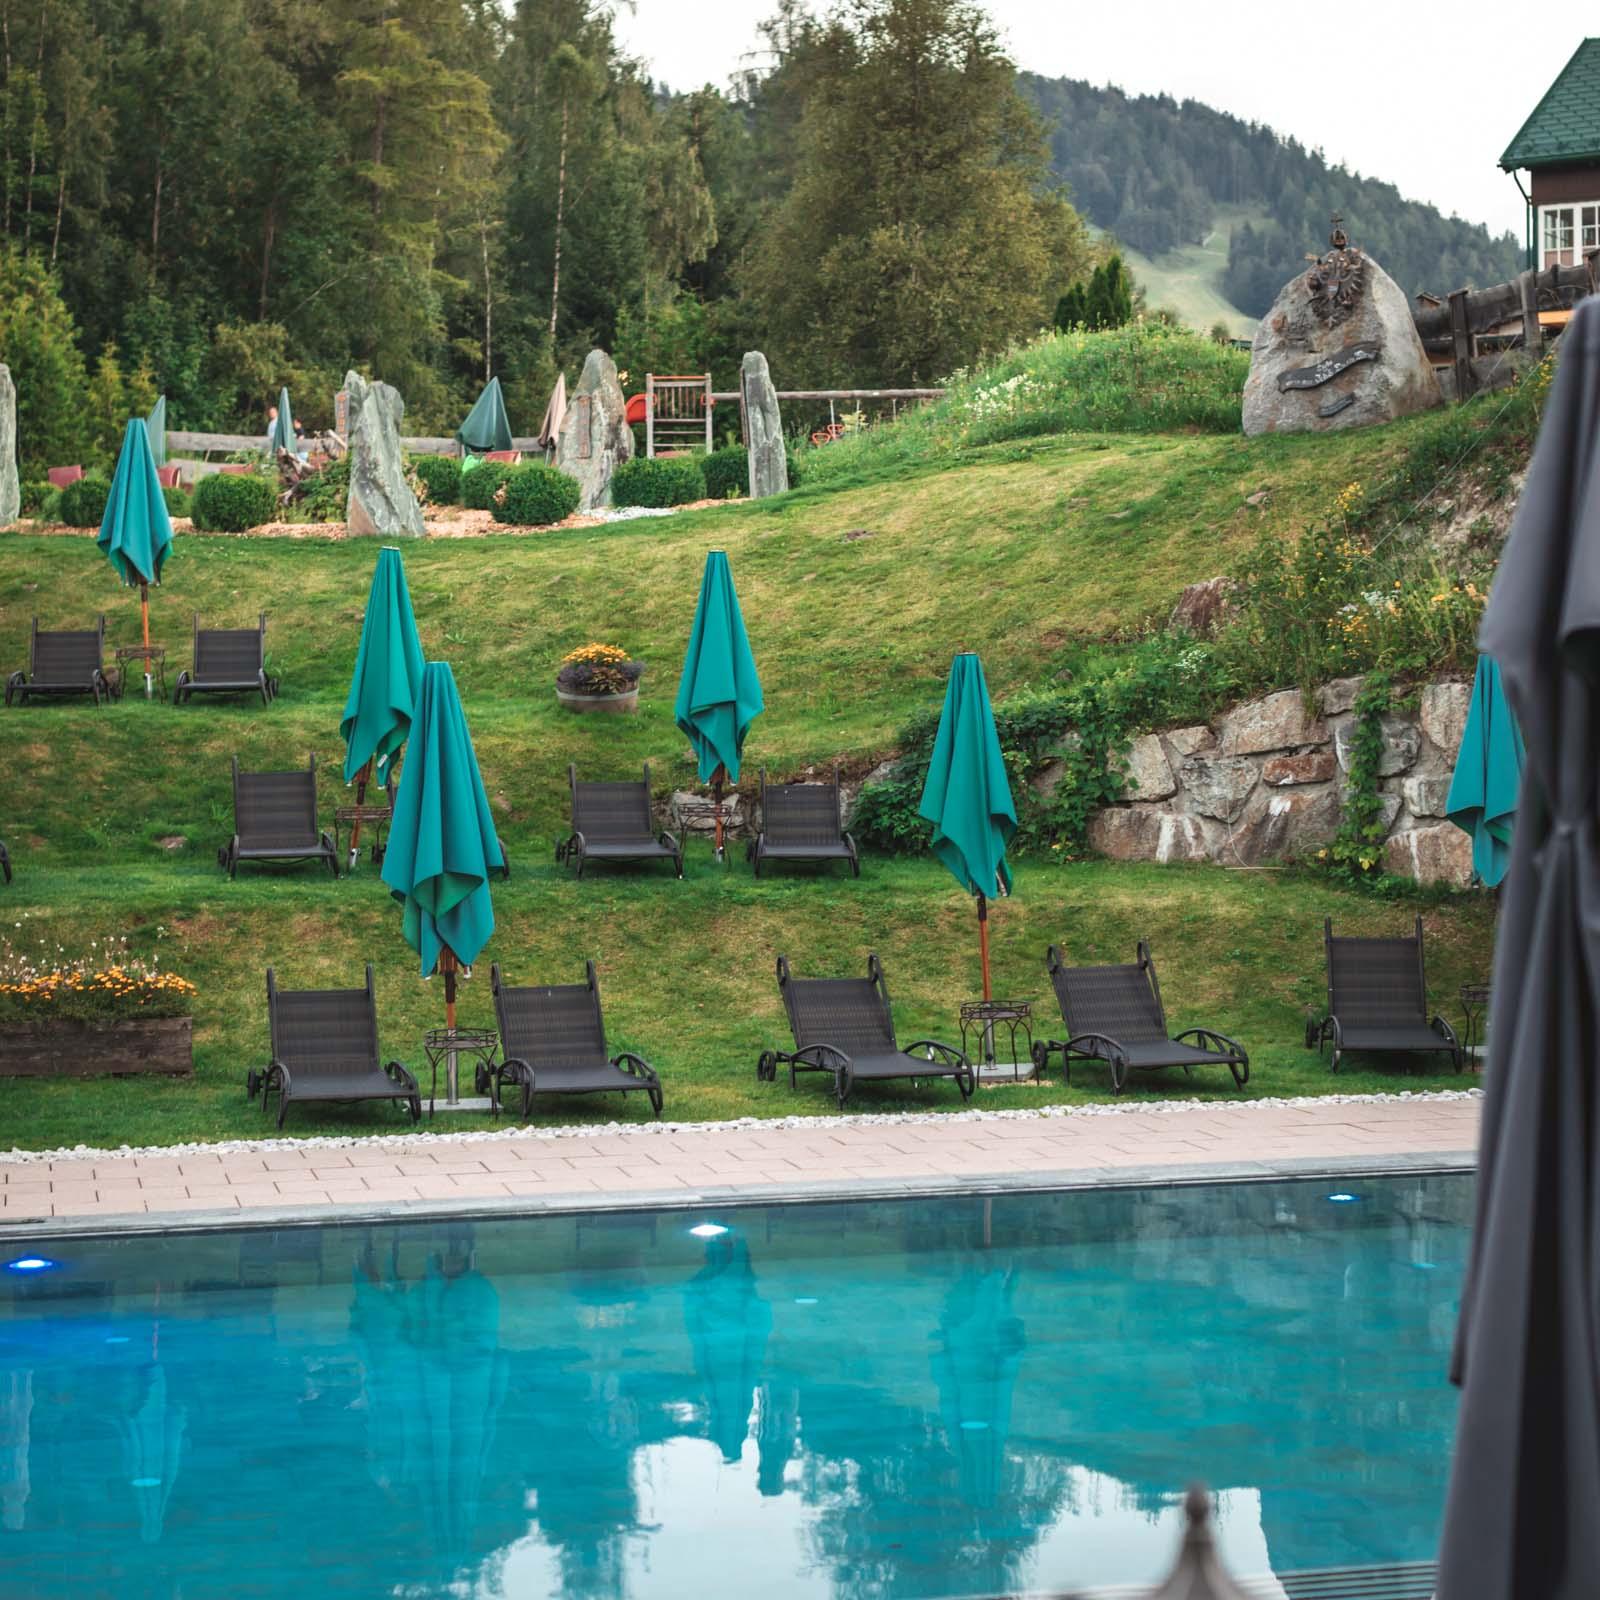 Familientage im Hotel Klosterbräu in Seefeld/Tirol